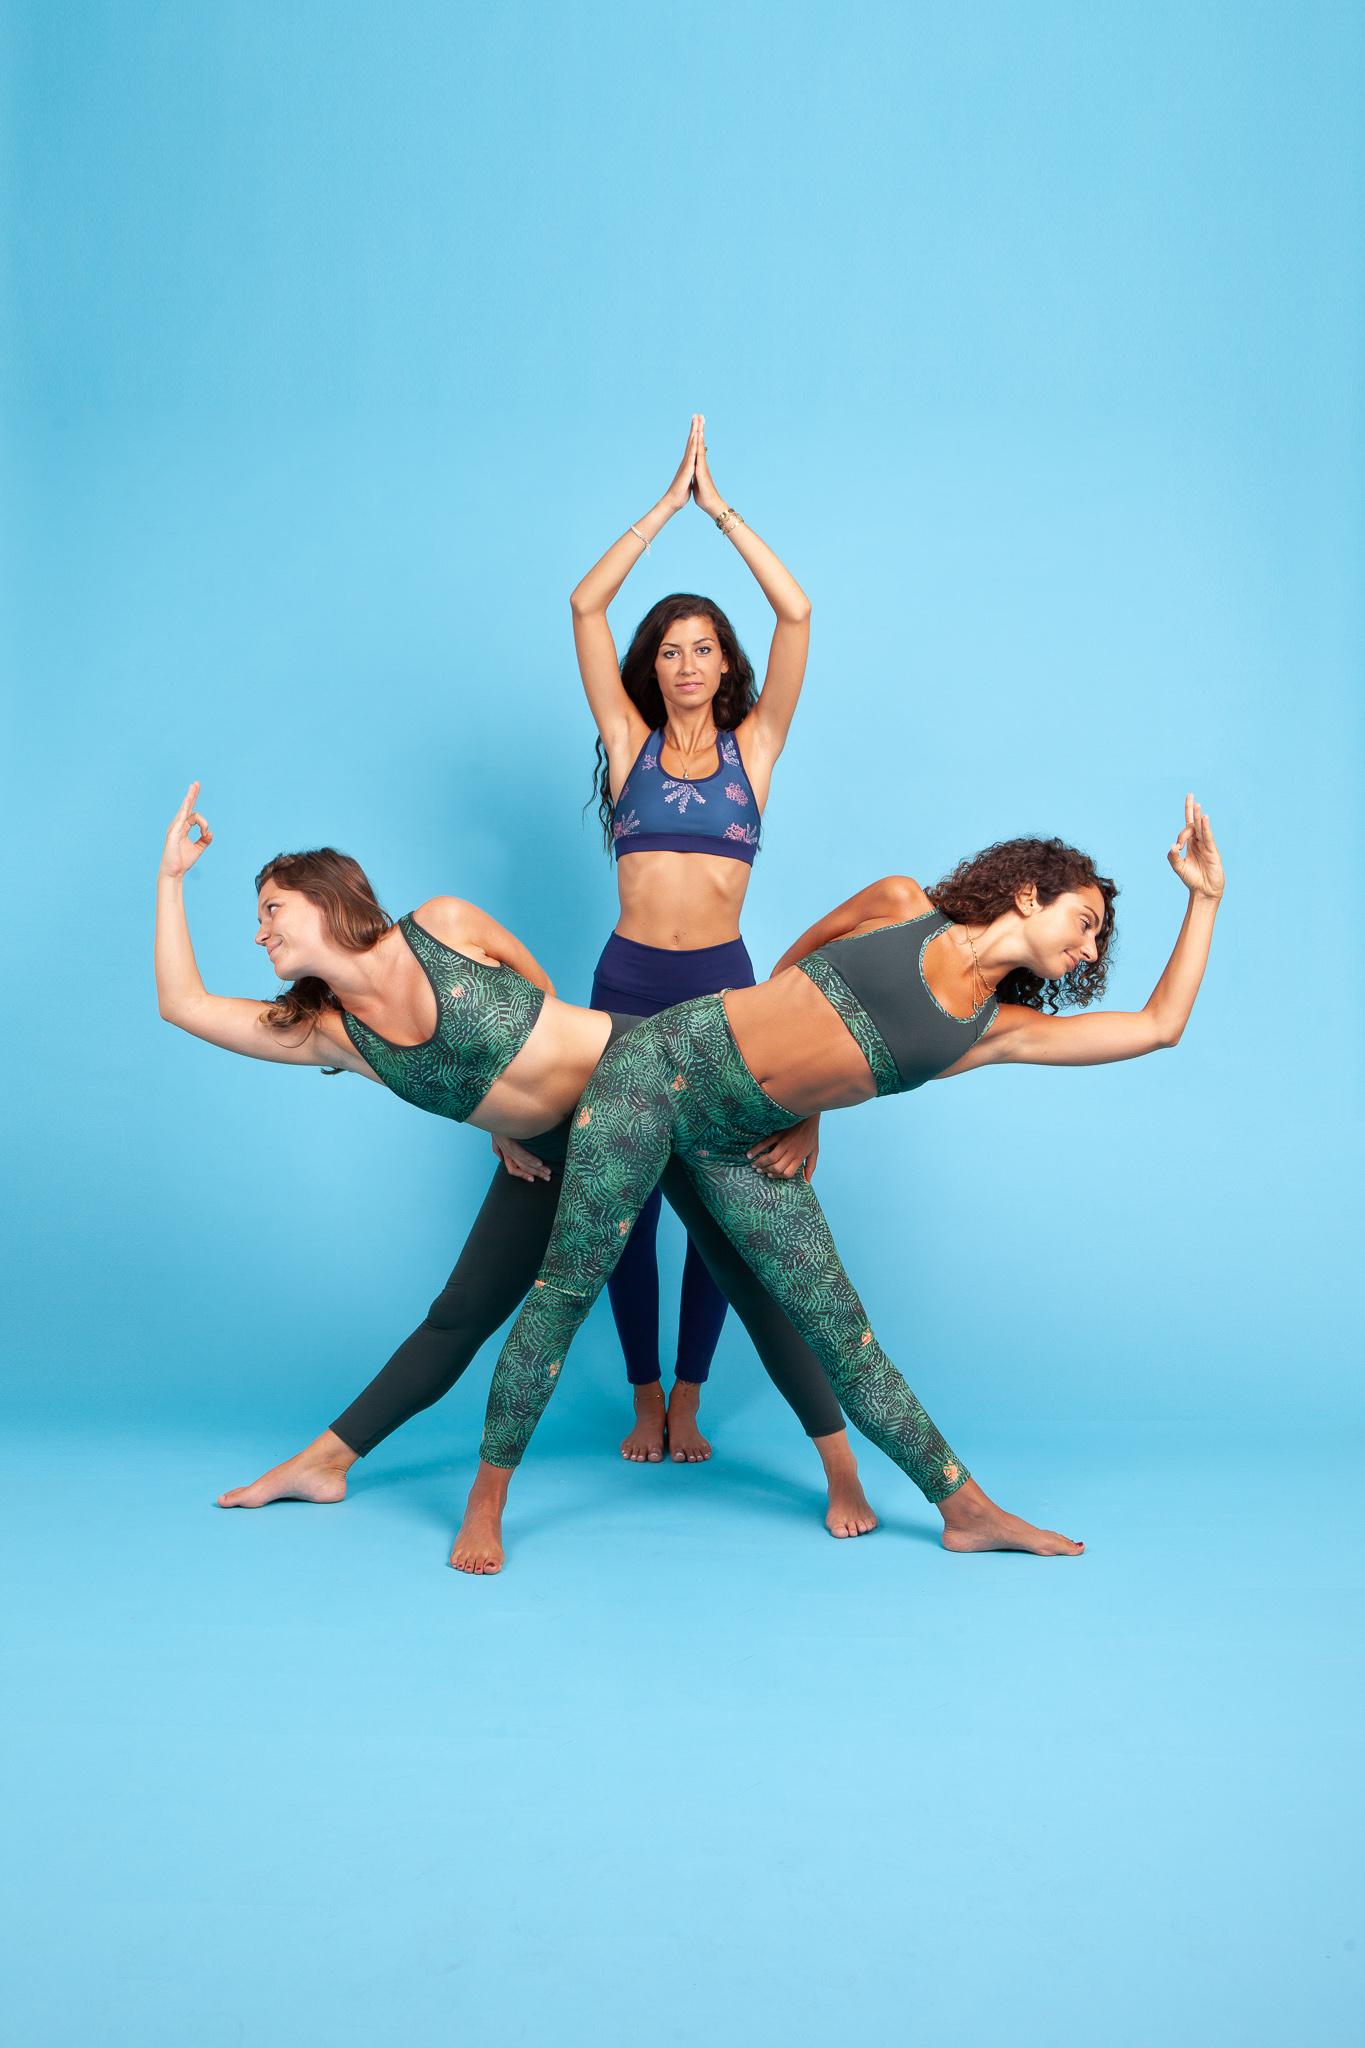 Code promo Yoga magazine : 4 tenues de yoga Baya à gagner